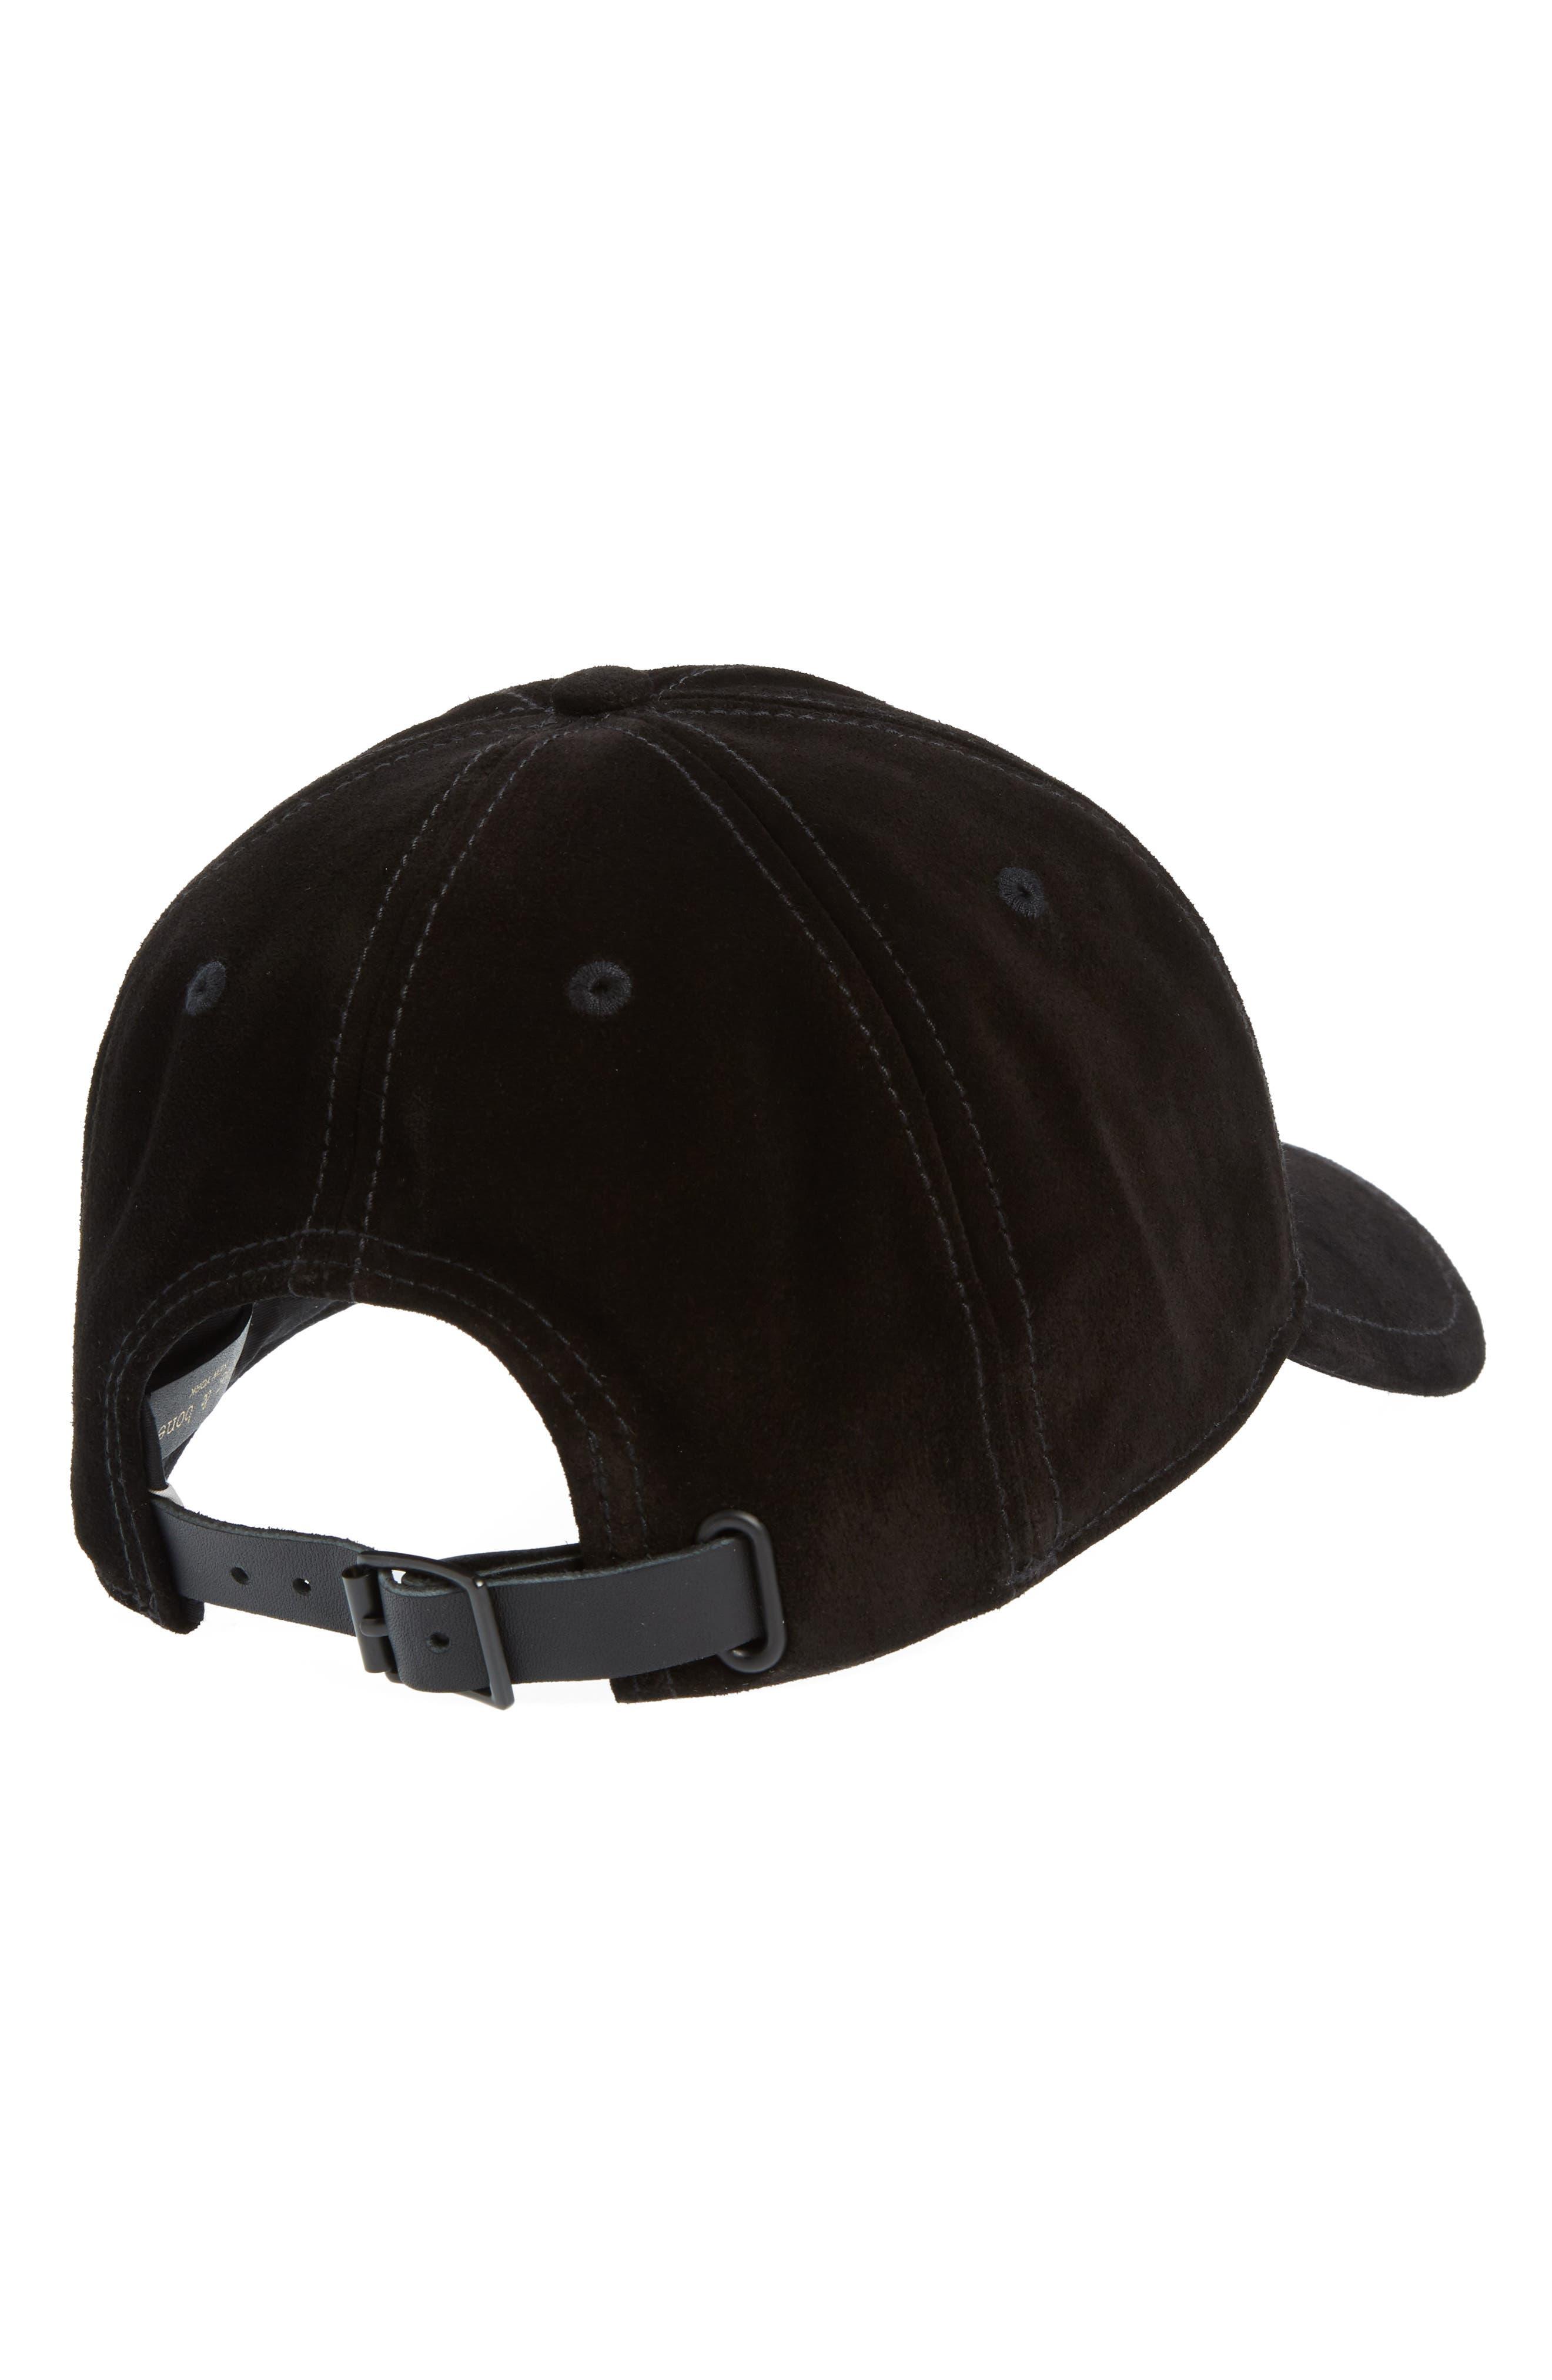 Lenox Ball Cap,                             Alternate thumbnail 2, color,                             Black Suede